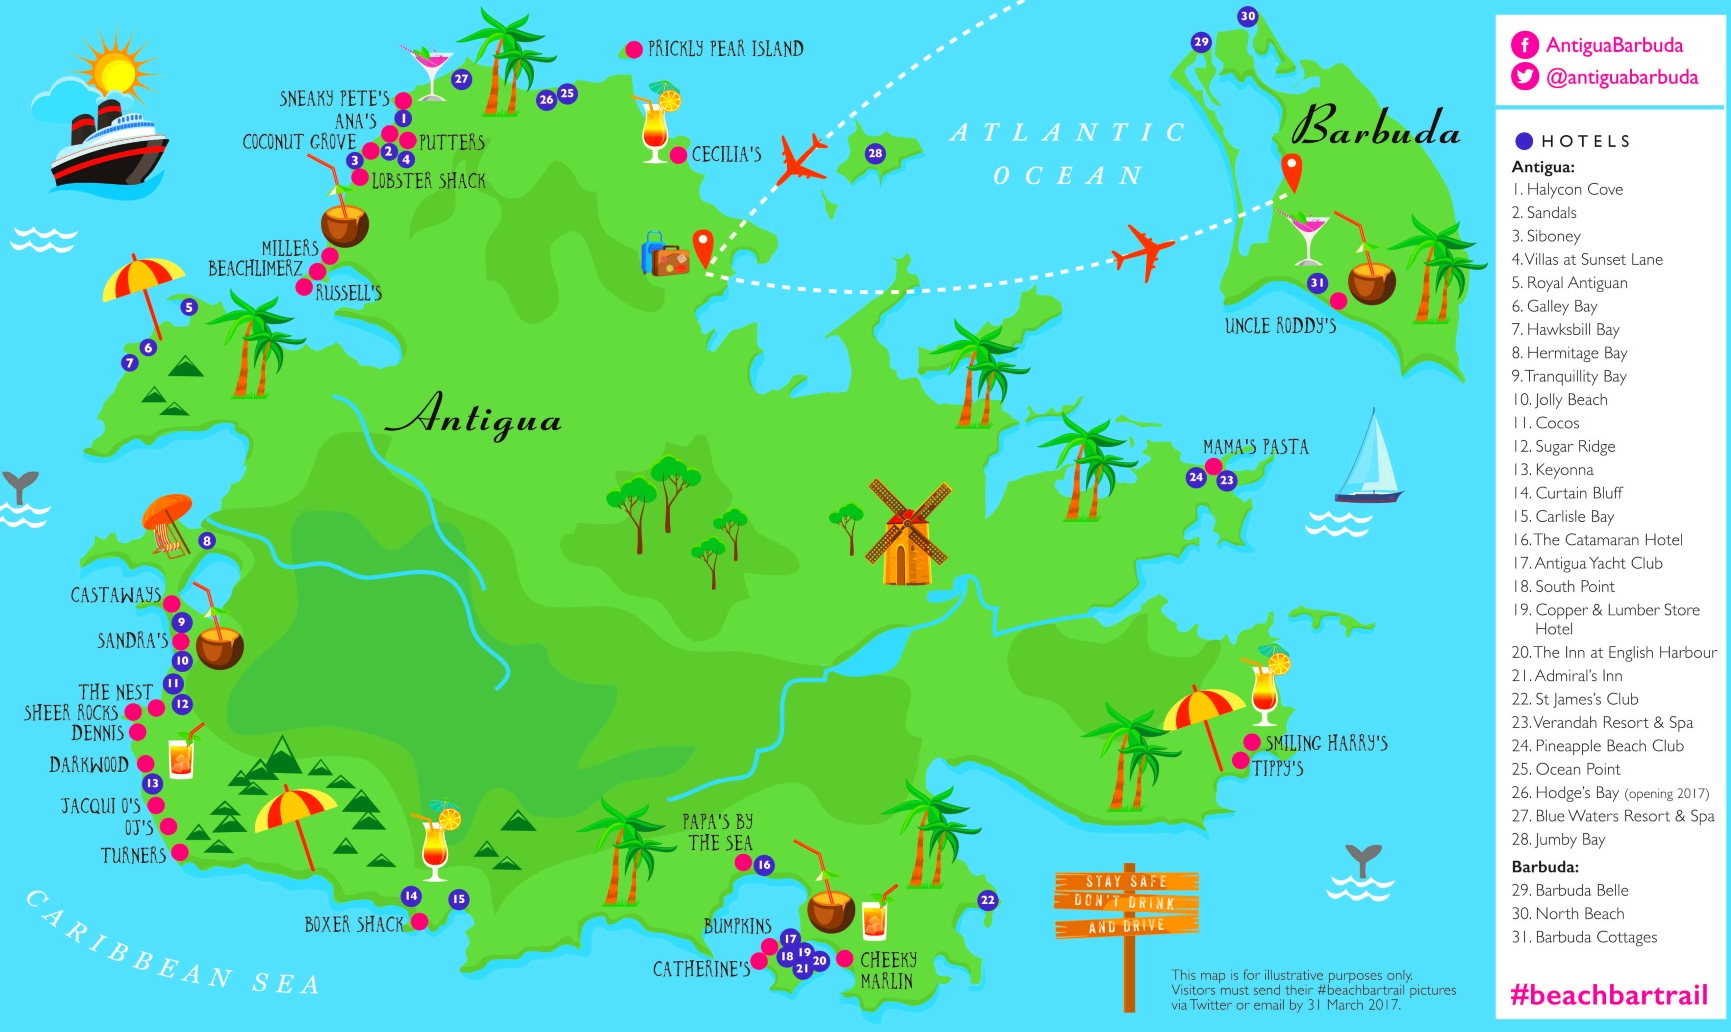 antigua karte Antigua und Barbuda hotel karte